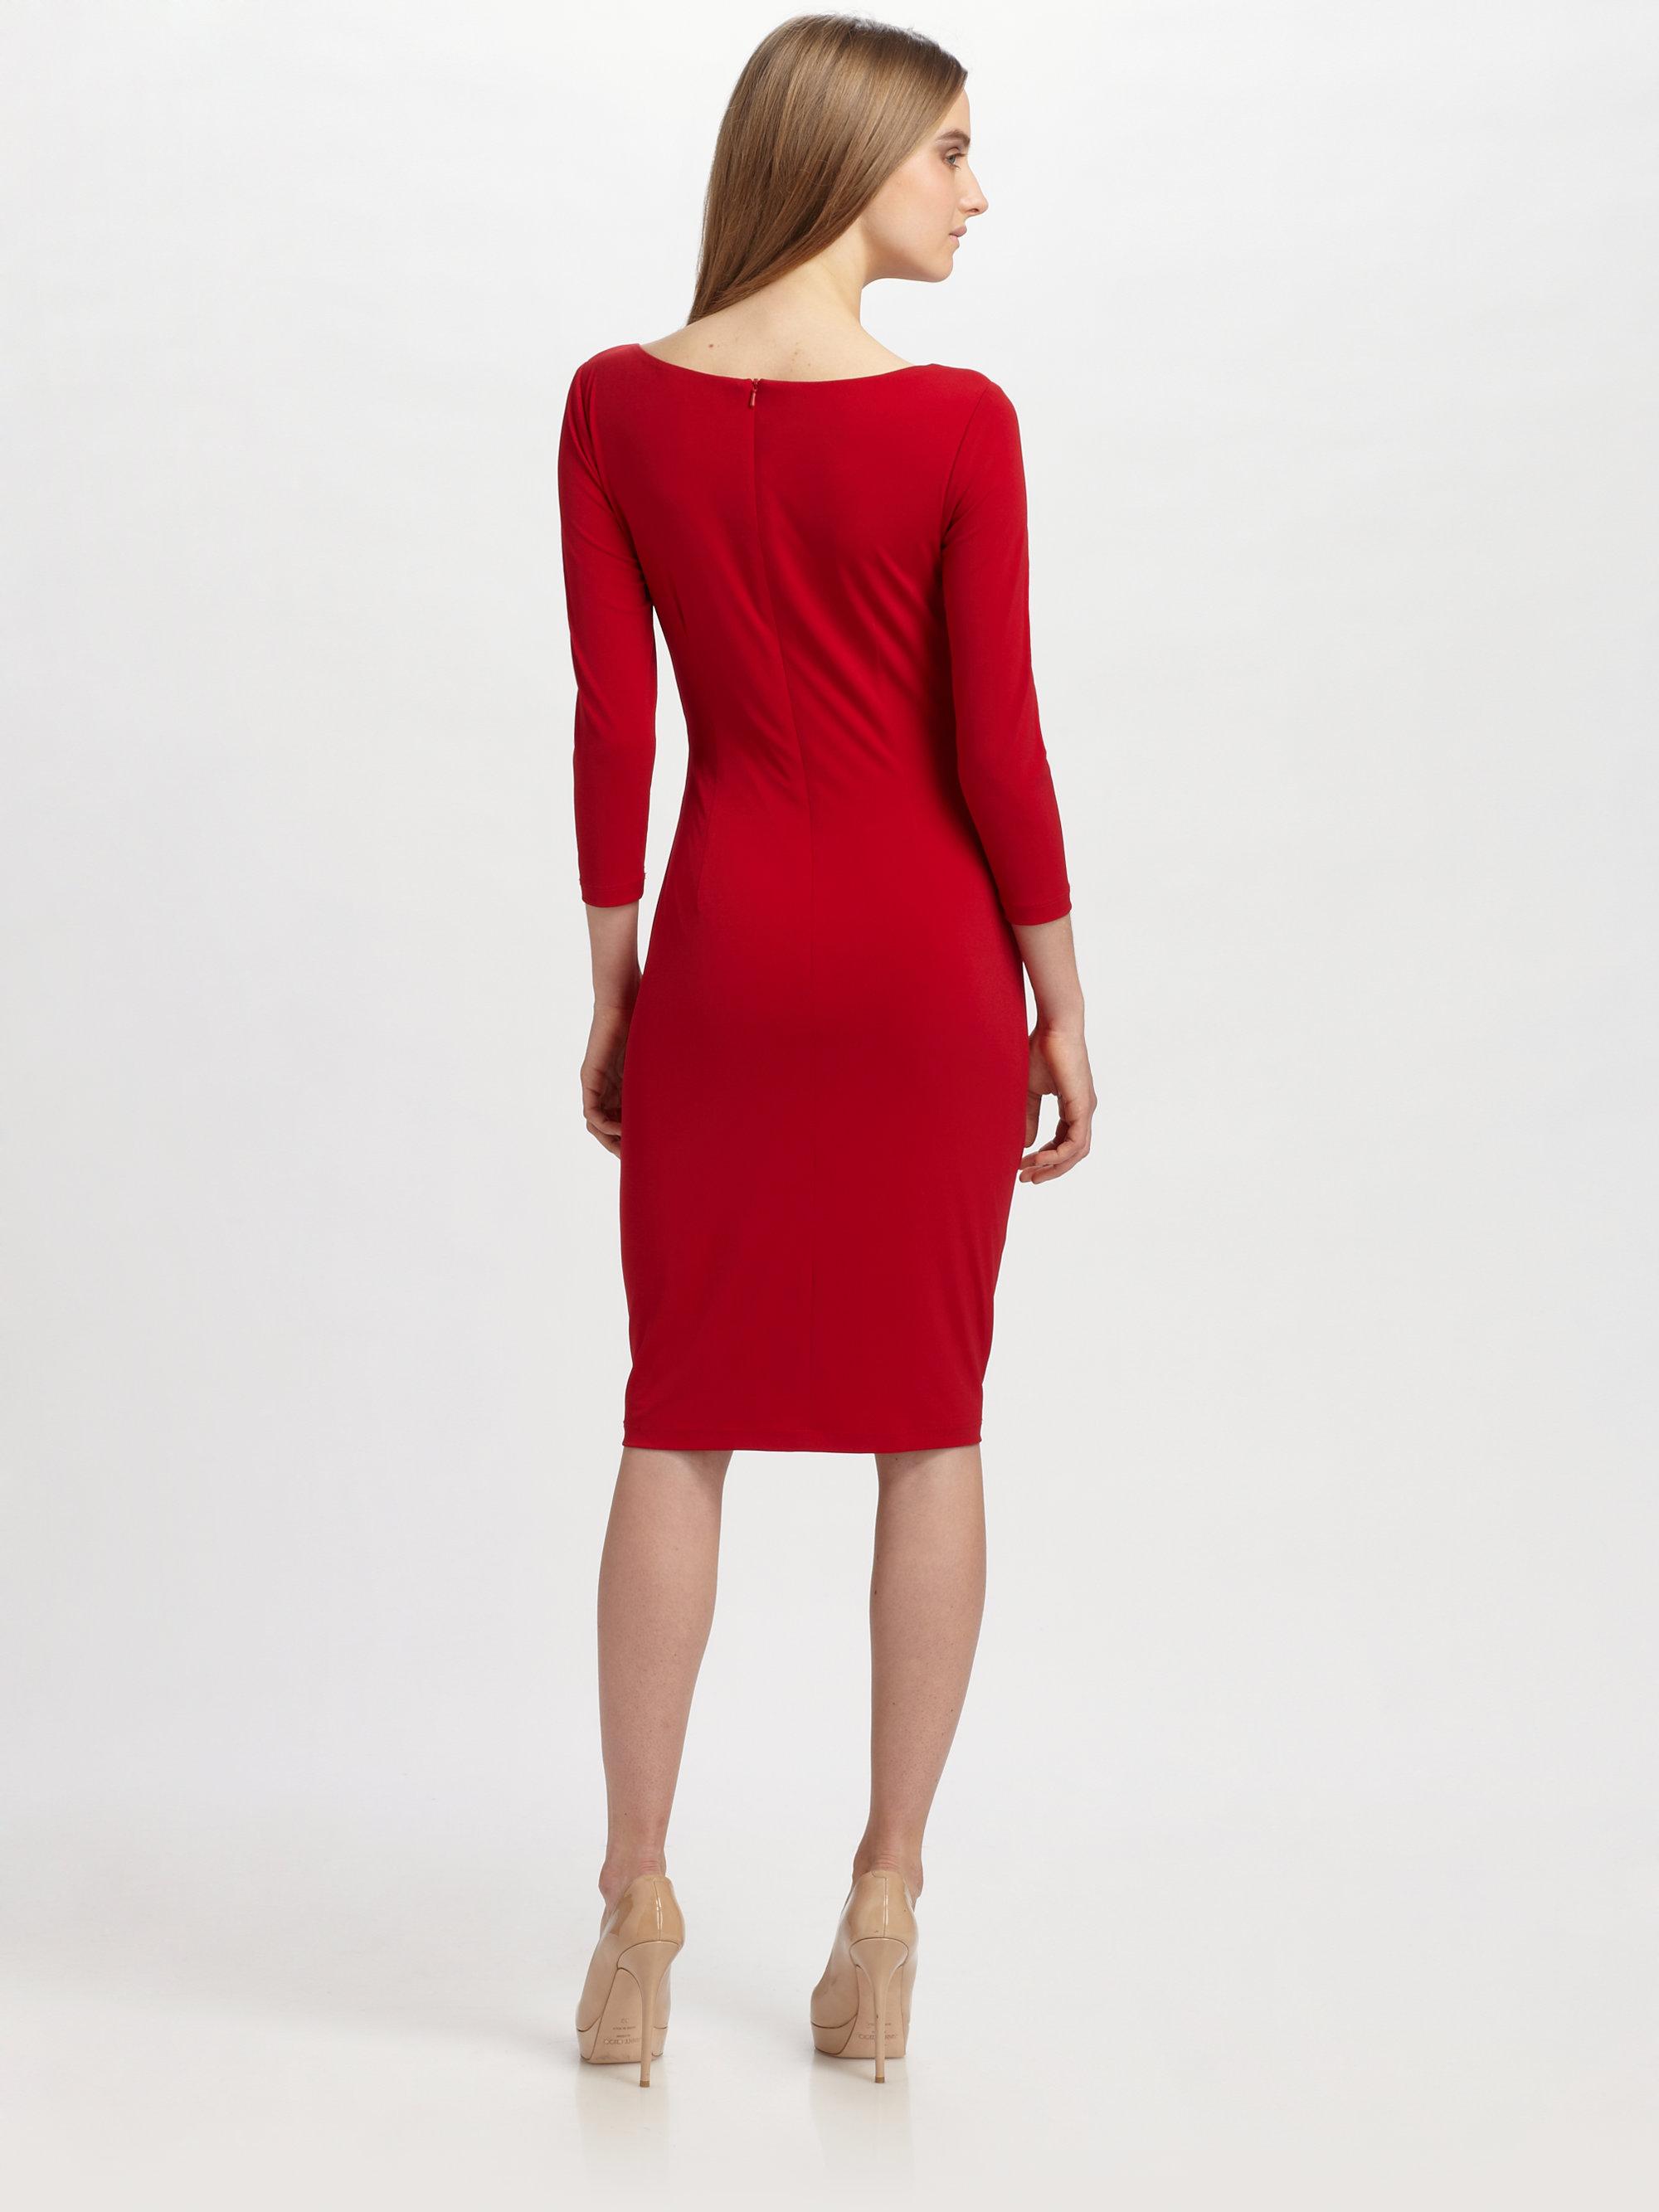 Lyst David Meister Matte Jersey Dress In Red